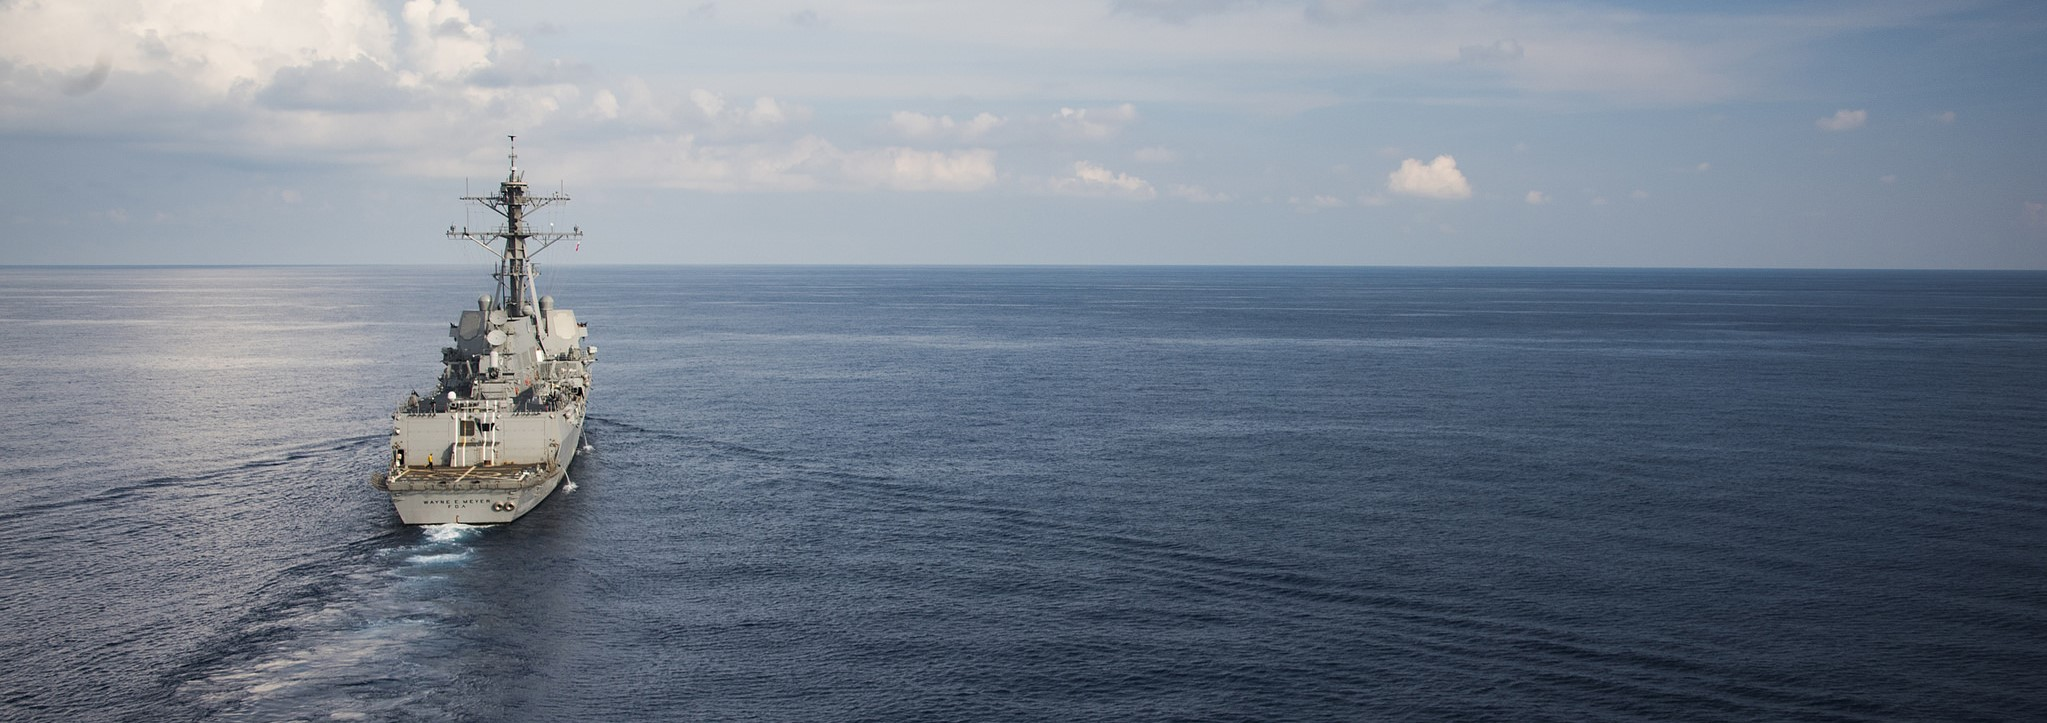 Flickr/US Pacific Fleet